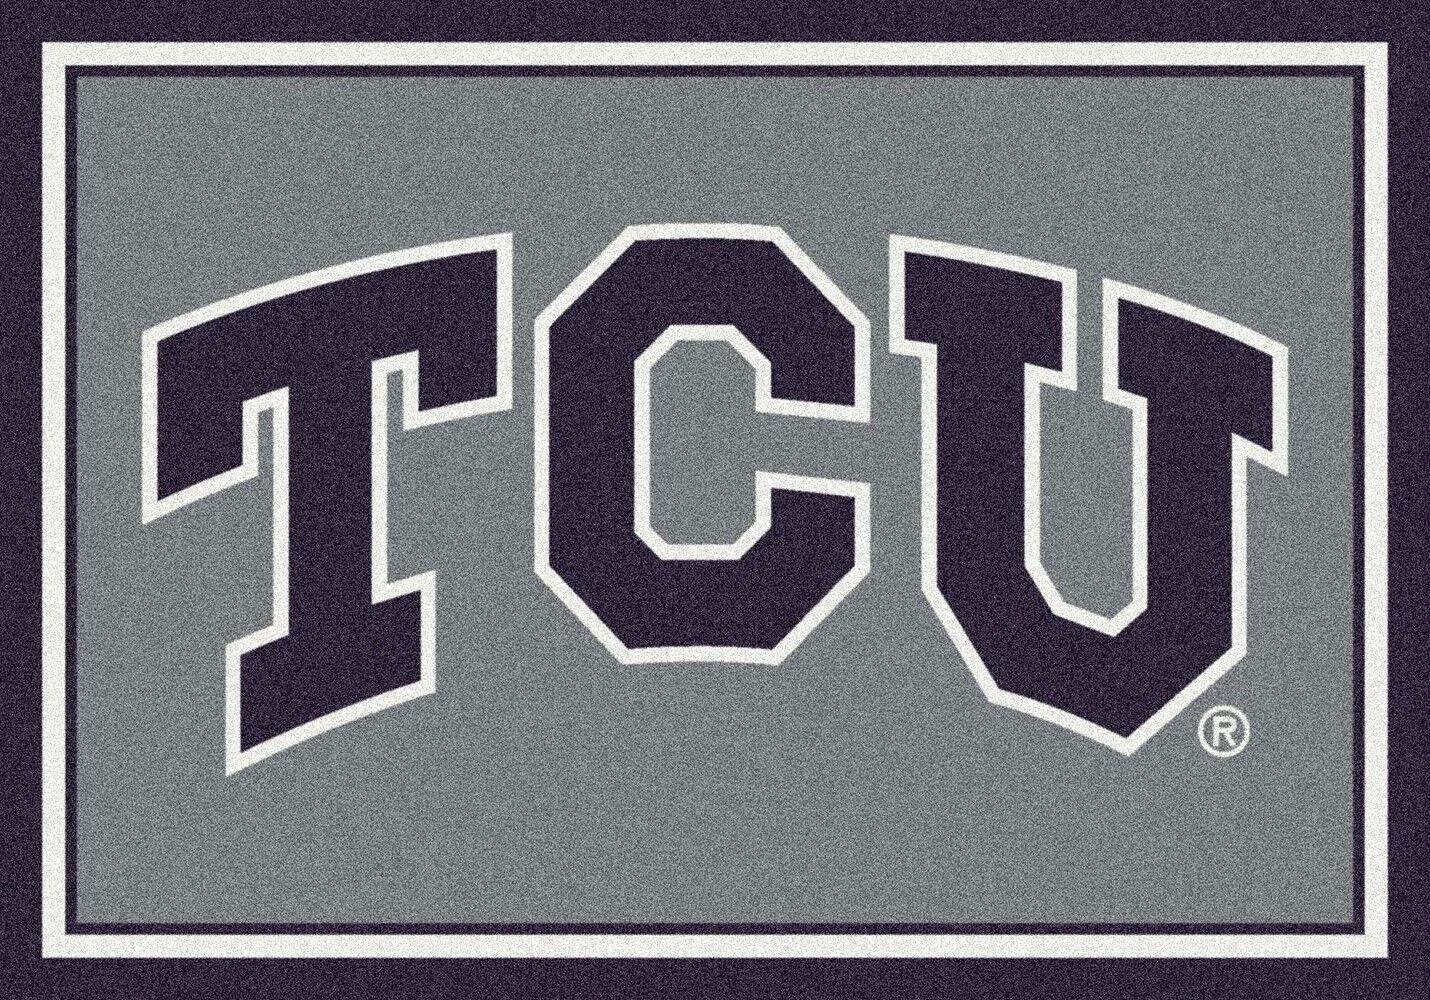 Texas Christian Horned Frogs NCAA Milliken Team Spirit Area Rug (3'10'' x 5'4'')